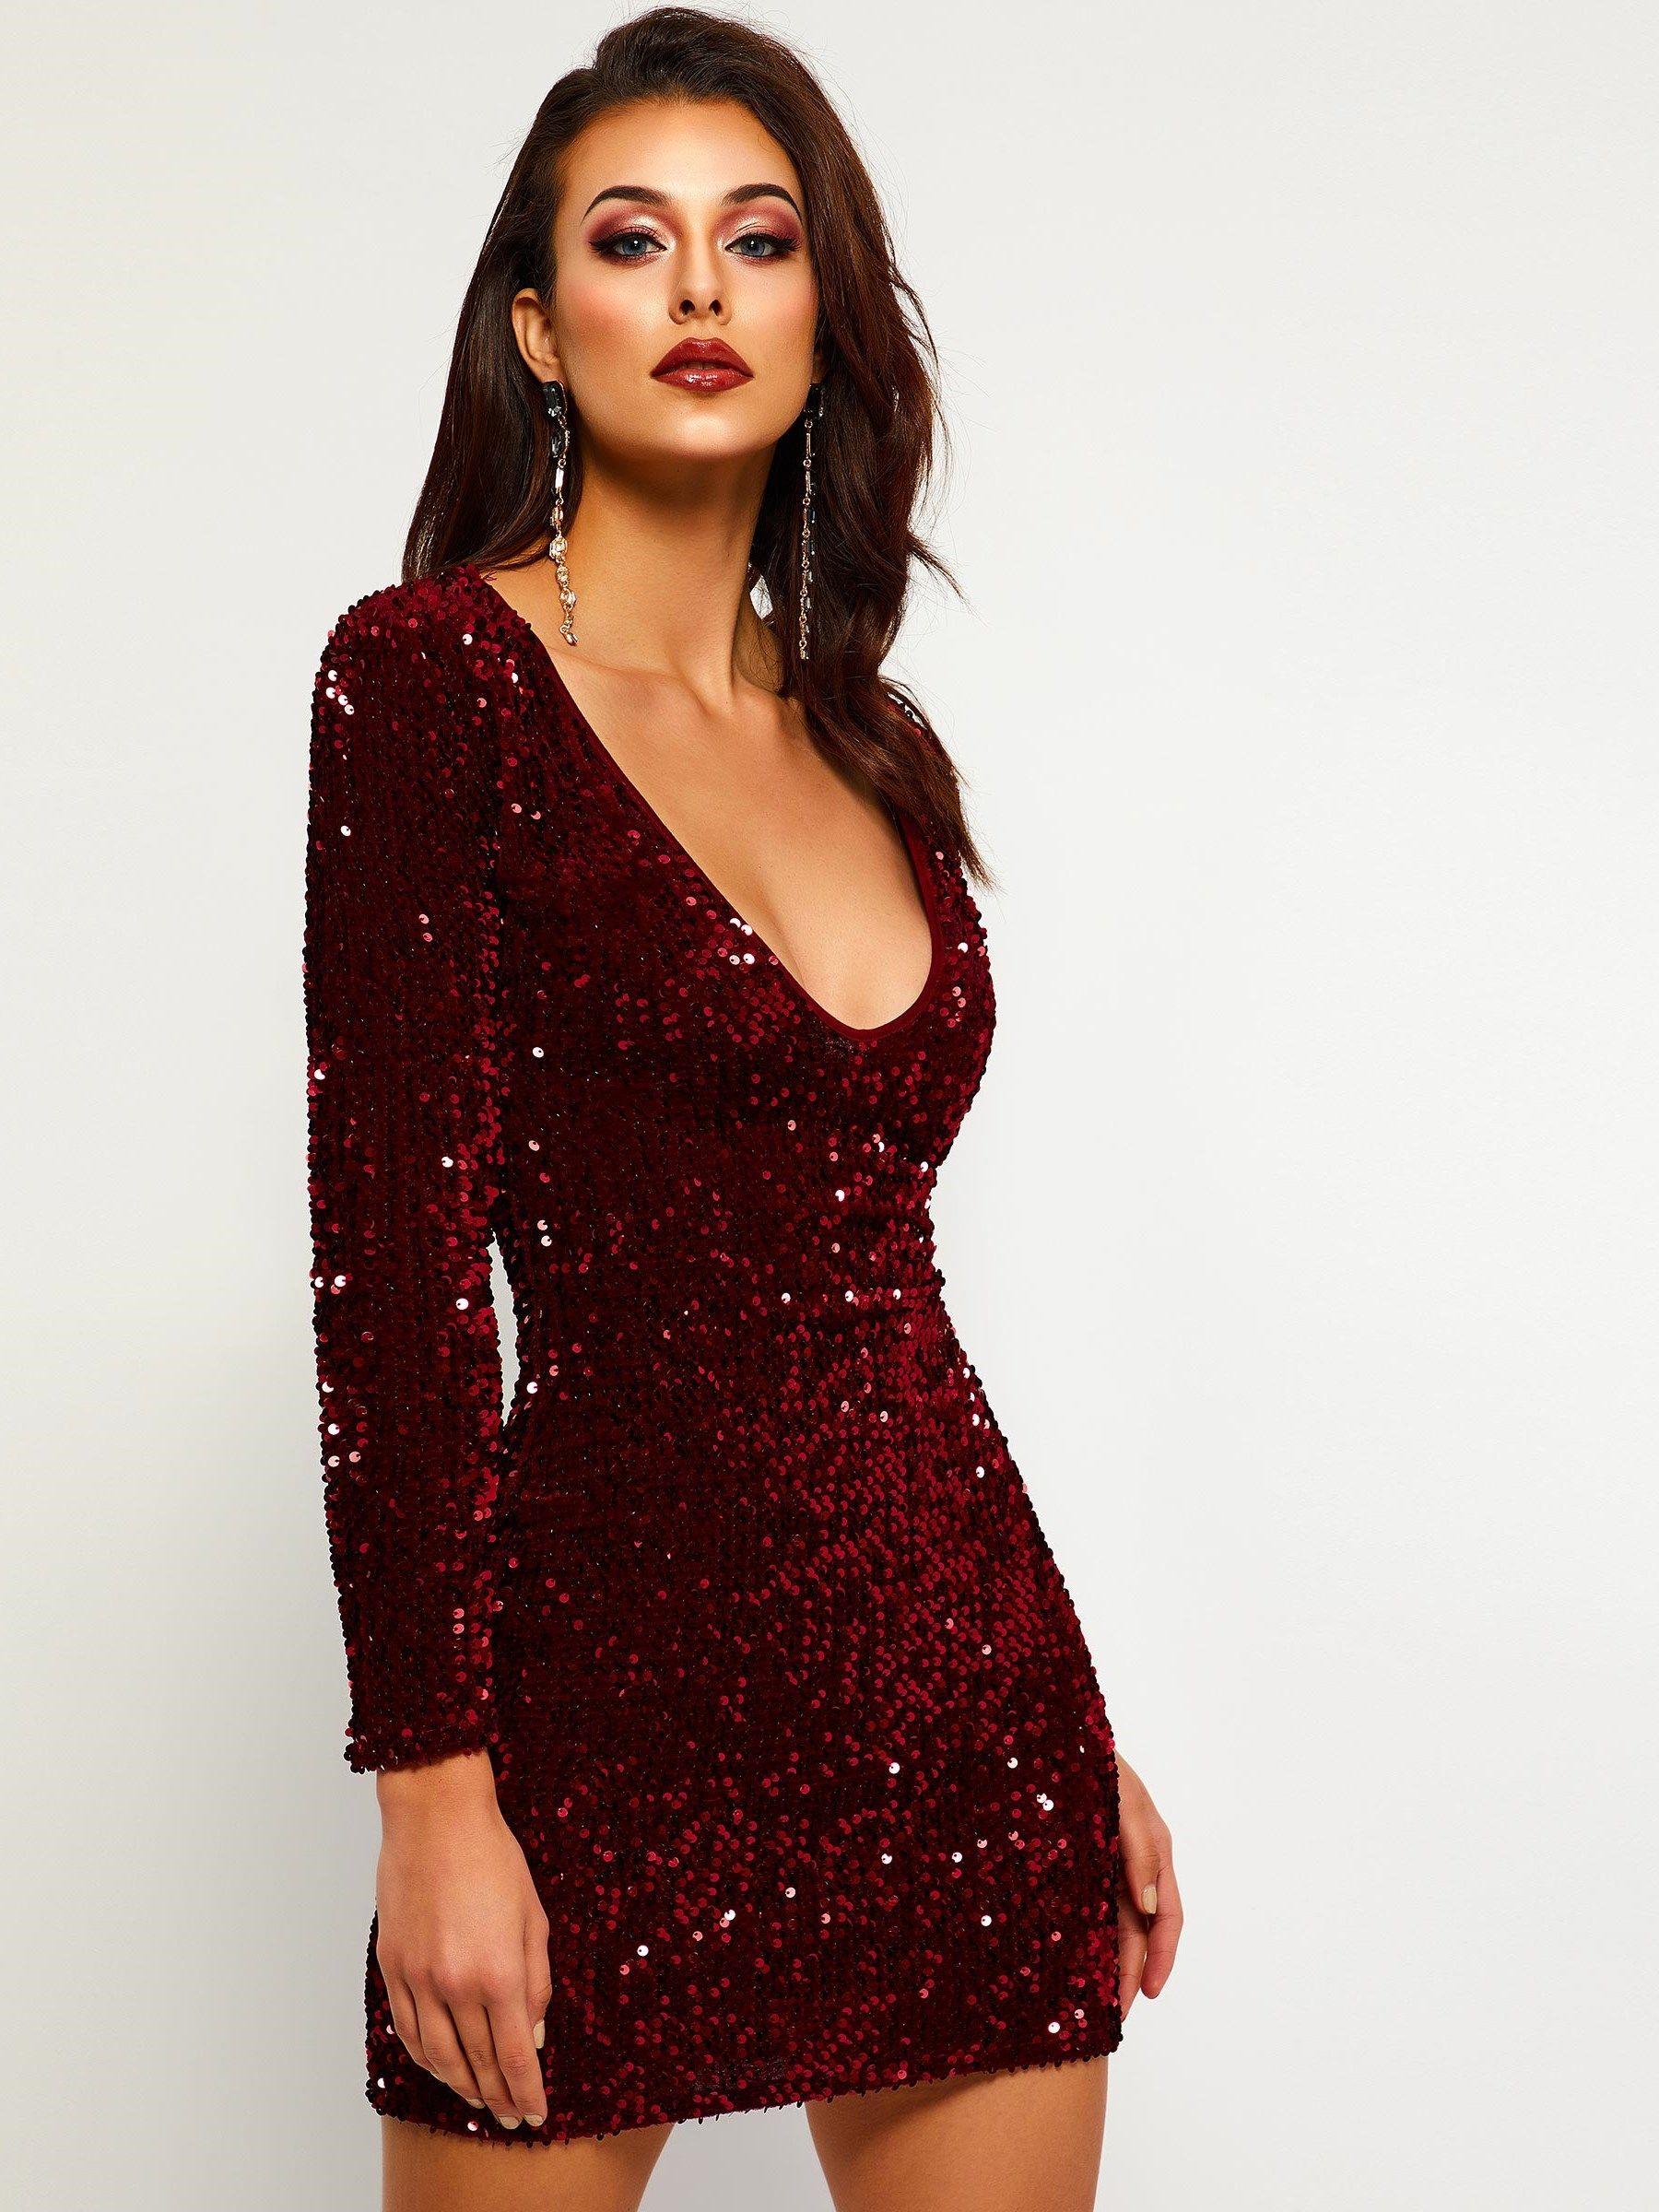 Sequins V-Neck Long Sleeve Women s Party Dress in 2019  44c34d6061c3